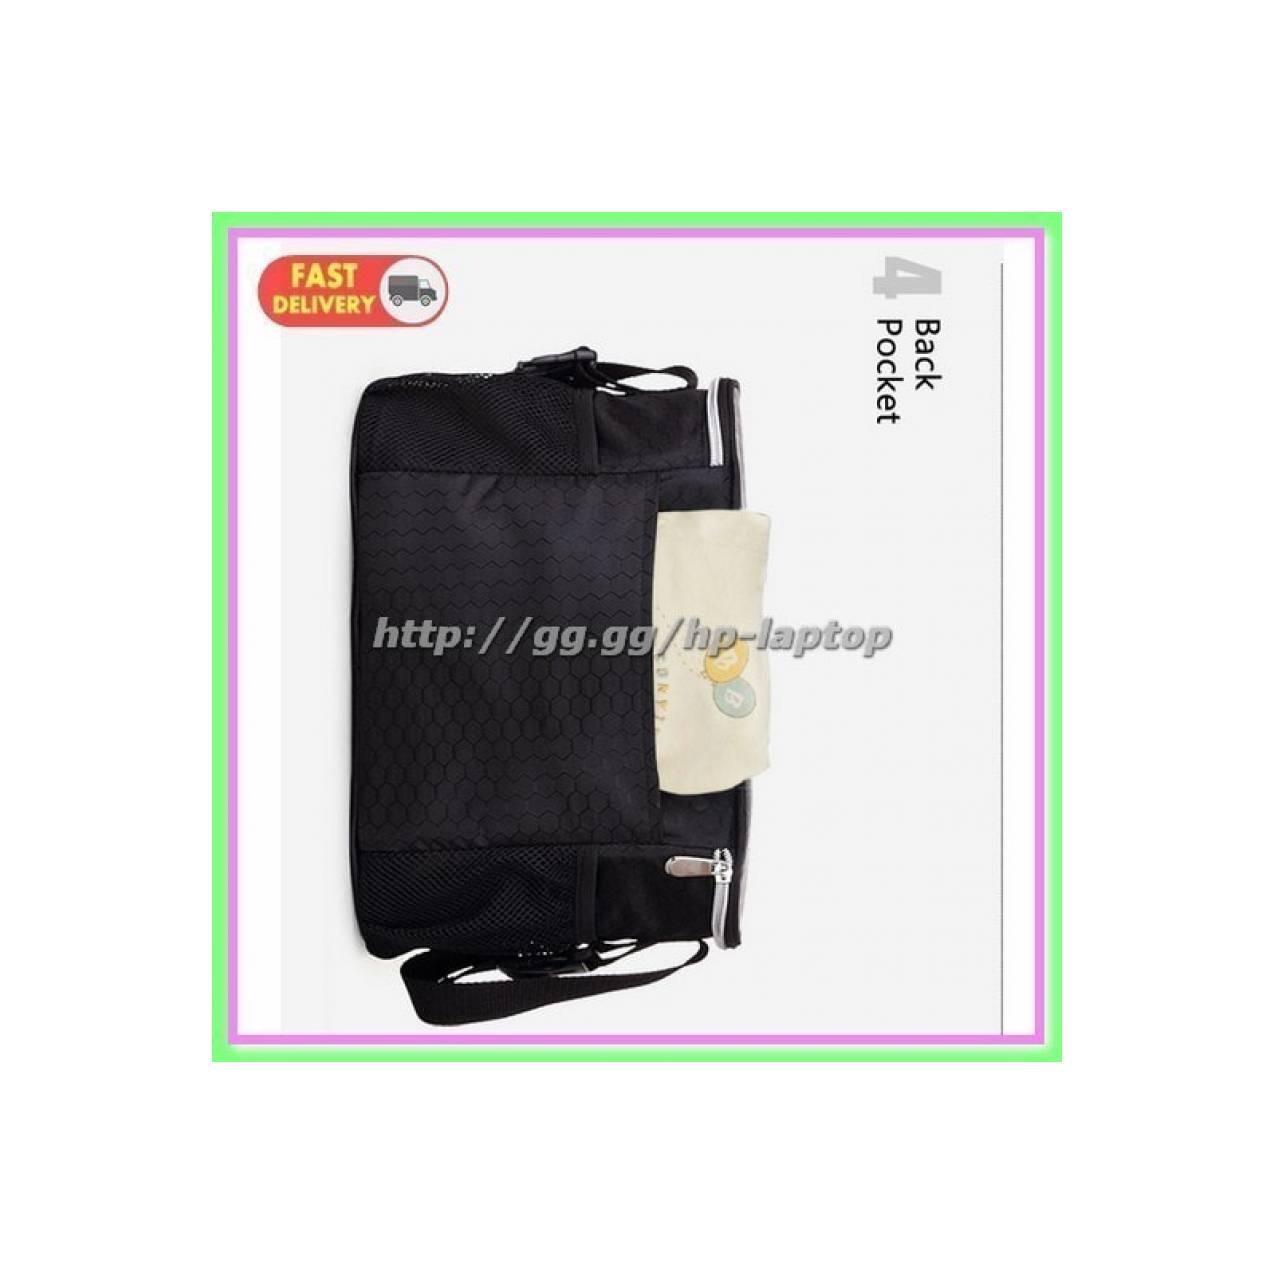 Tas Stroller Kereta Dorong Bayi Multifungsi Black